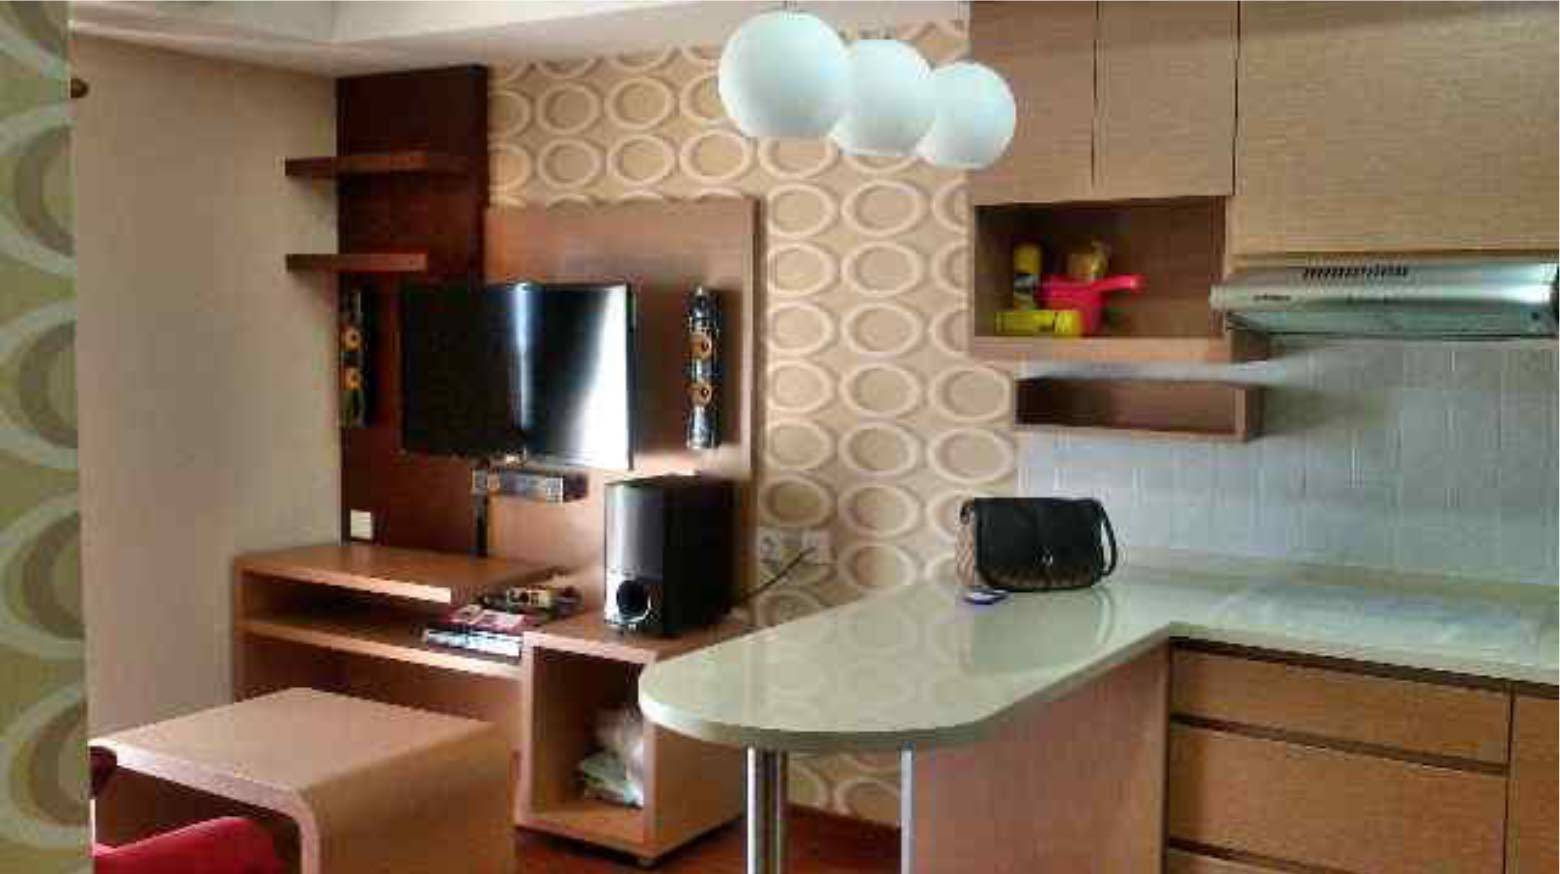 Aneka Jasa Interior The Wave Epicentrum Apartment At Kuningan Jakarta, Indonesia Jakarta, Indonesia Livingroom   6947